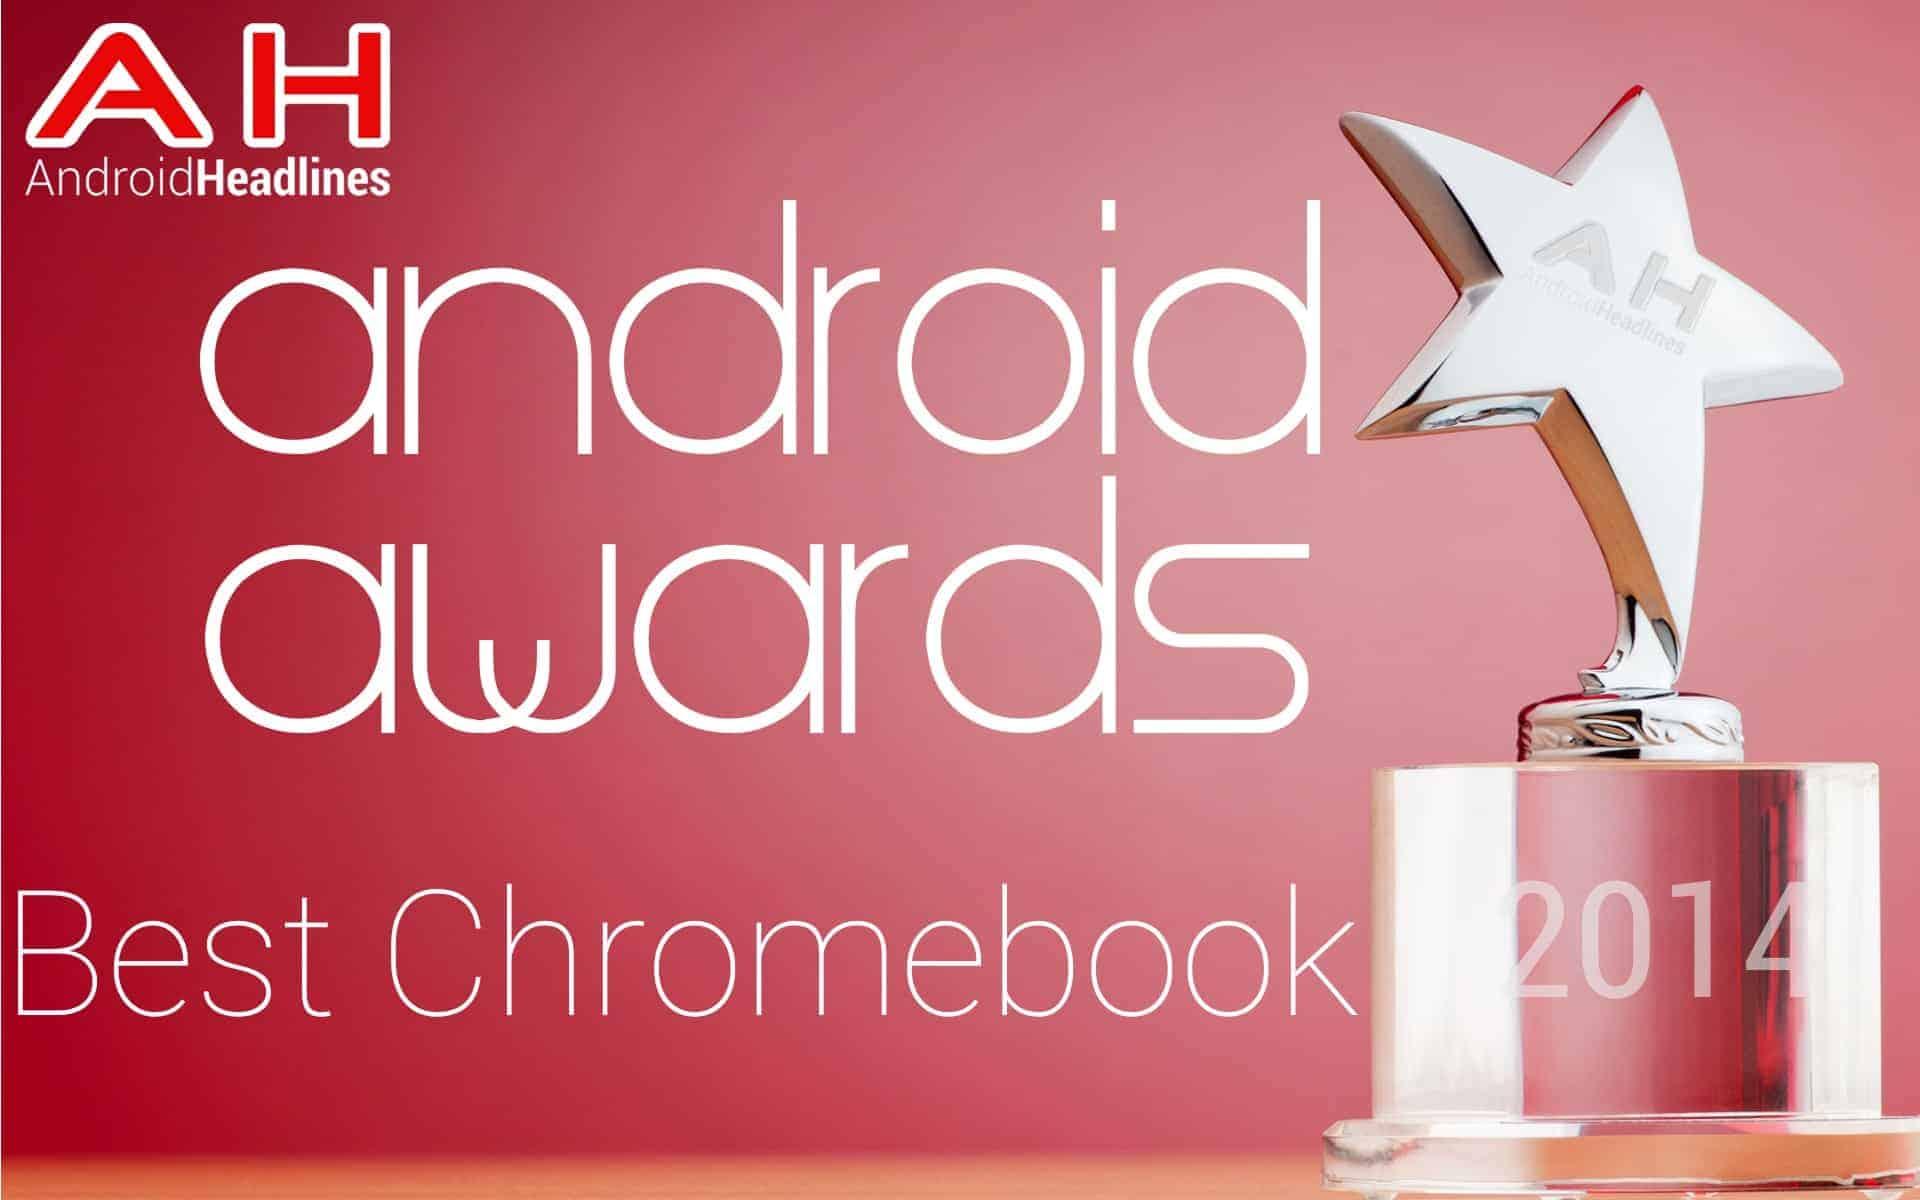 AH Awards 2014 Best Google Chromebook of the year